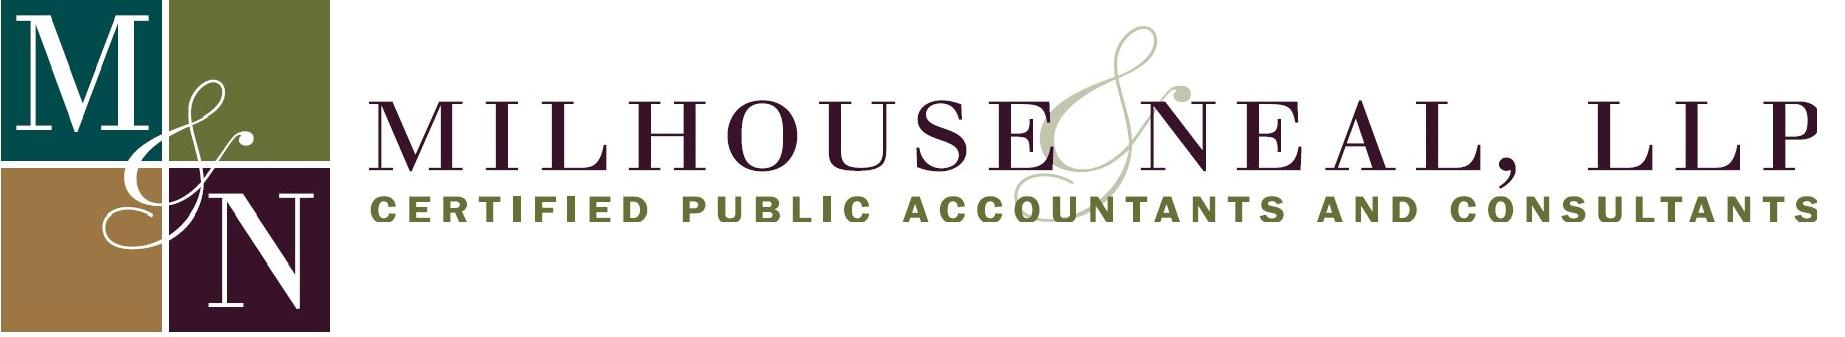 Milhouse & Neal, LLP Logo